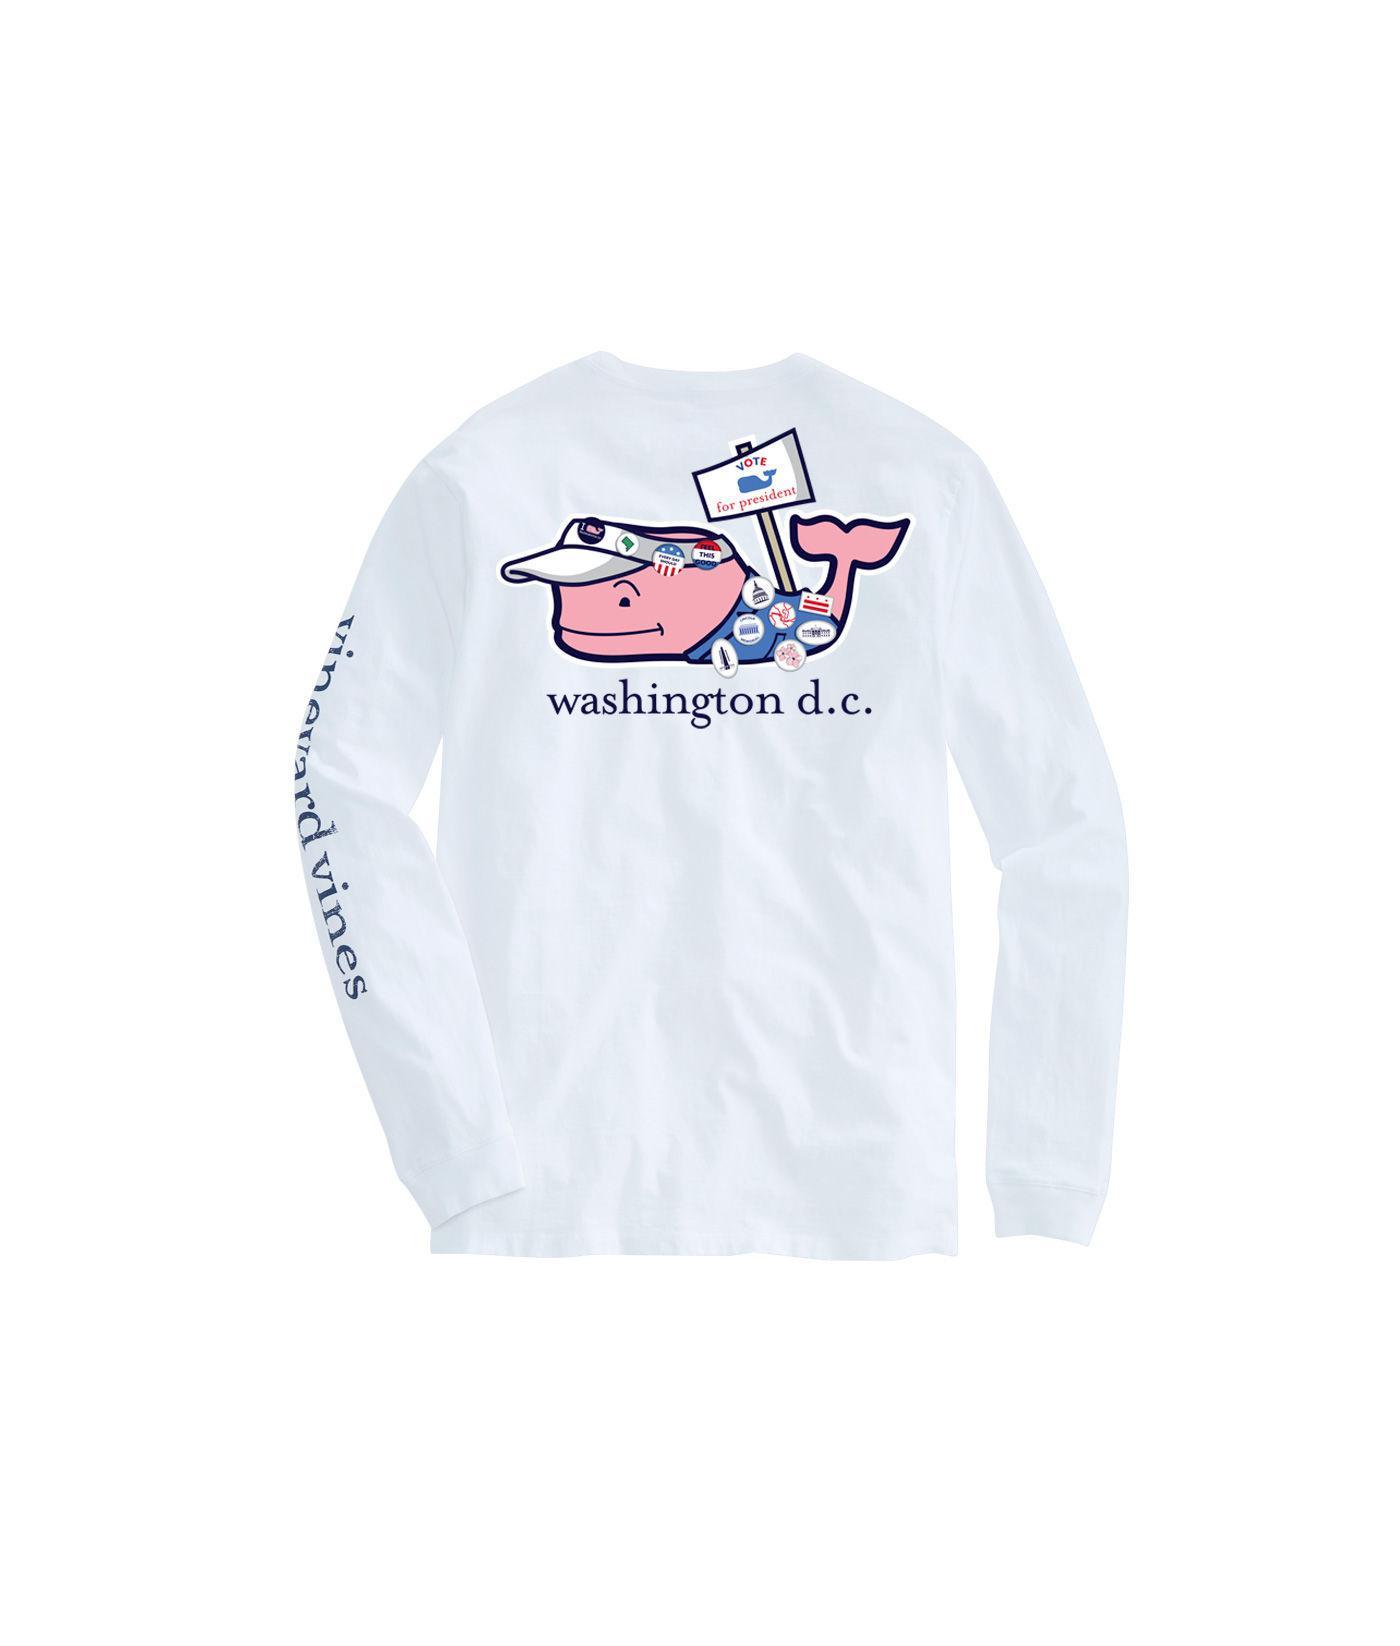 fd847789 Vineyard Vines Adult Long-sleeve Fallen Patriots T-shirt in White ...